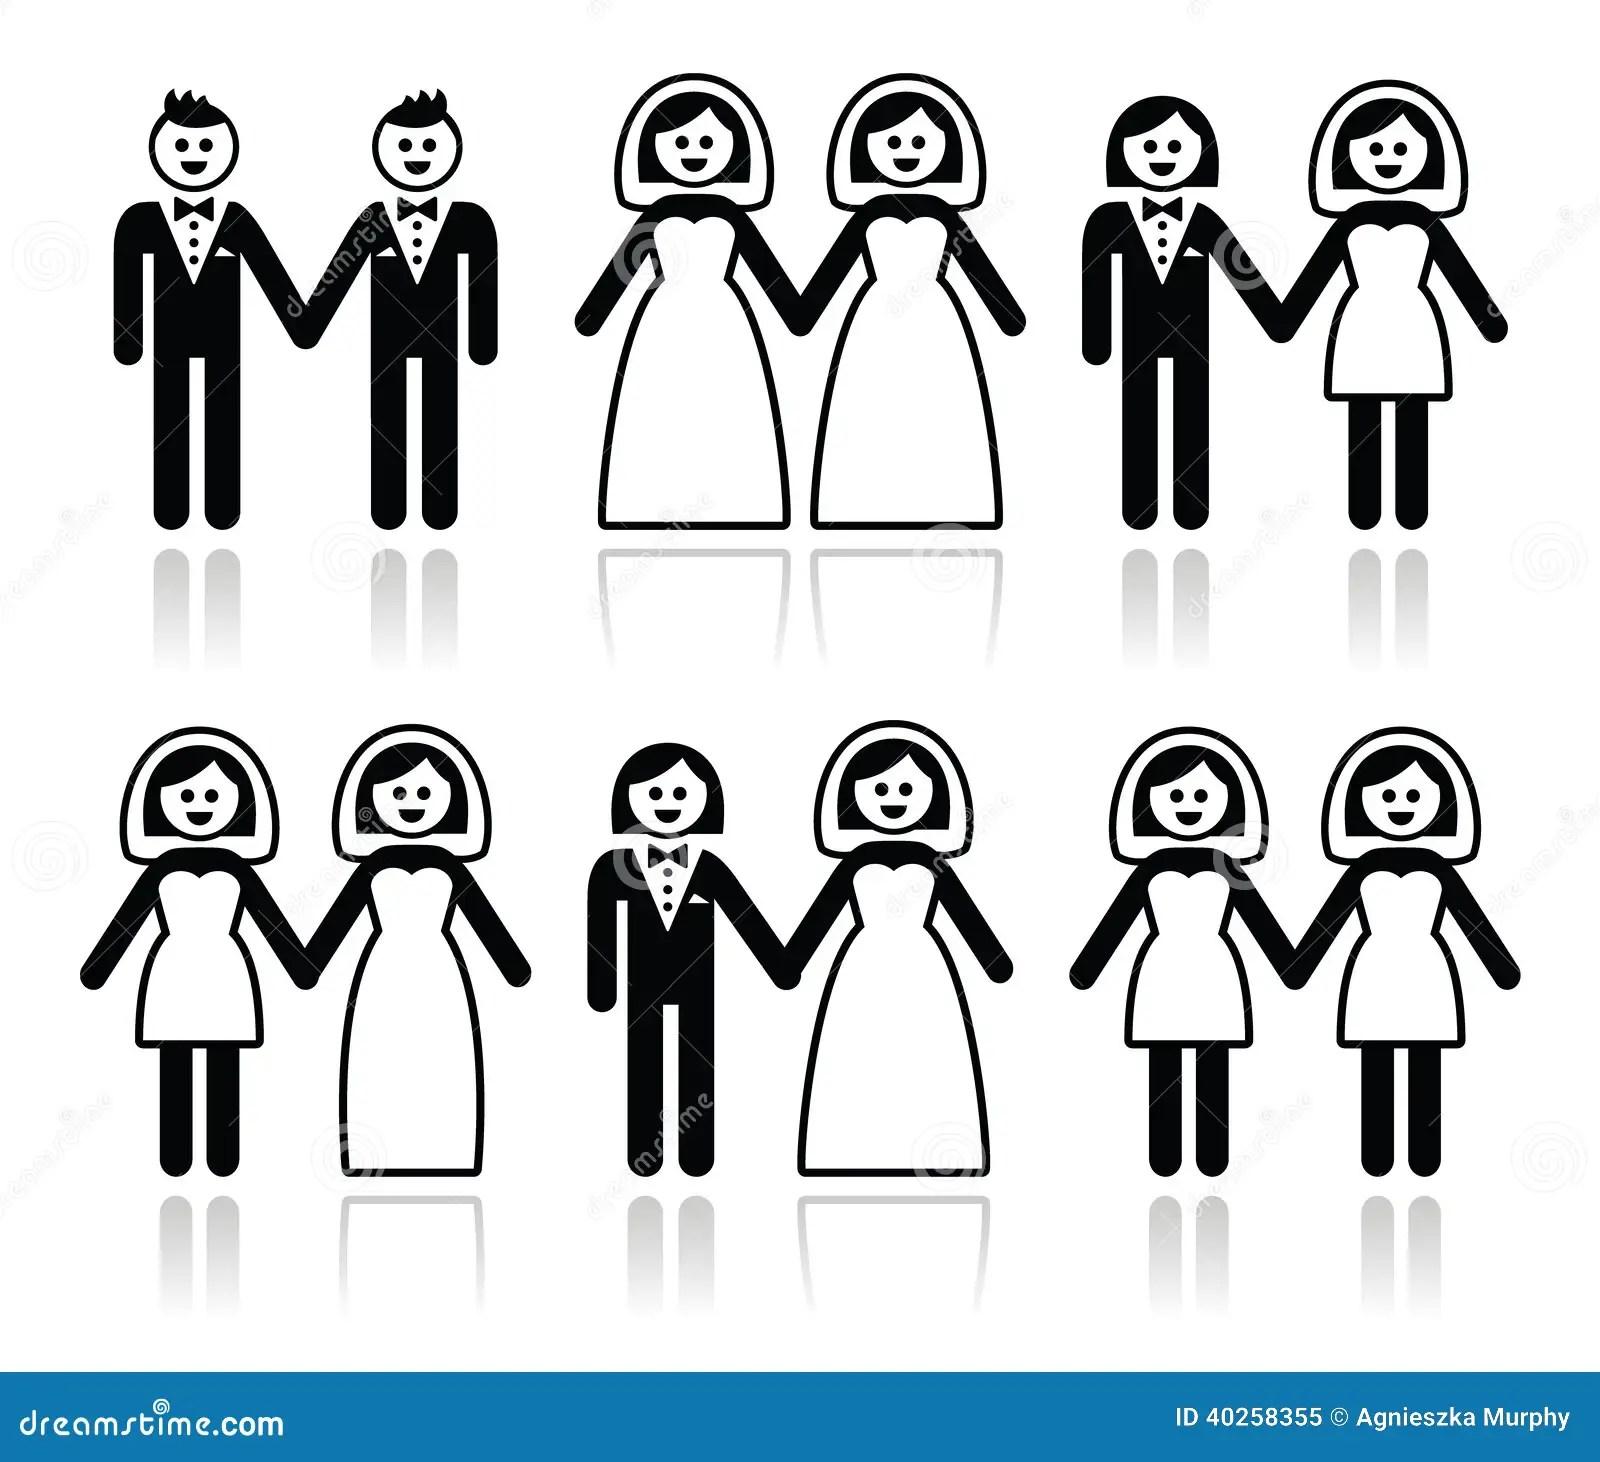 And Lesbian Wedding